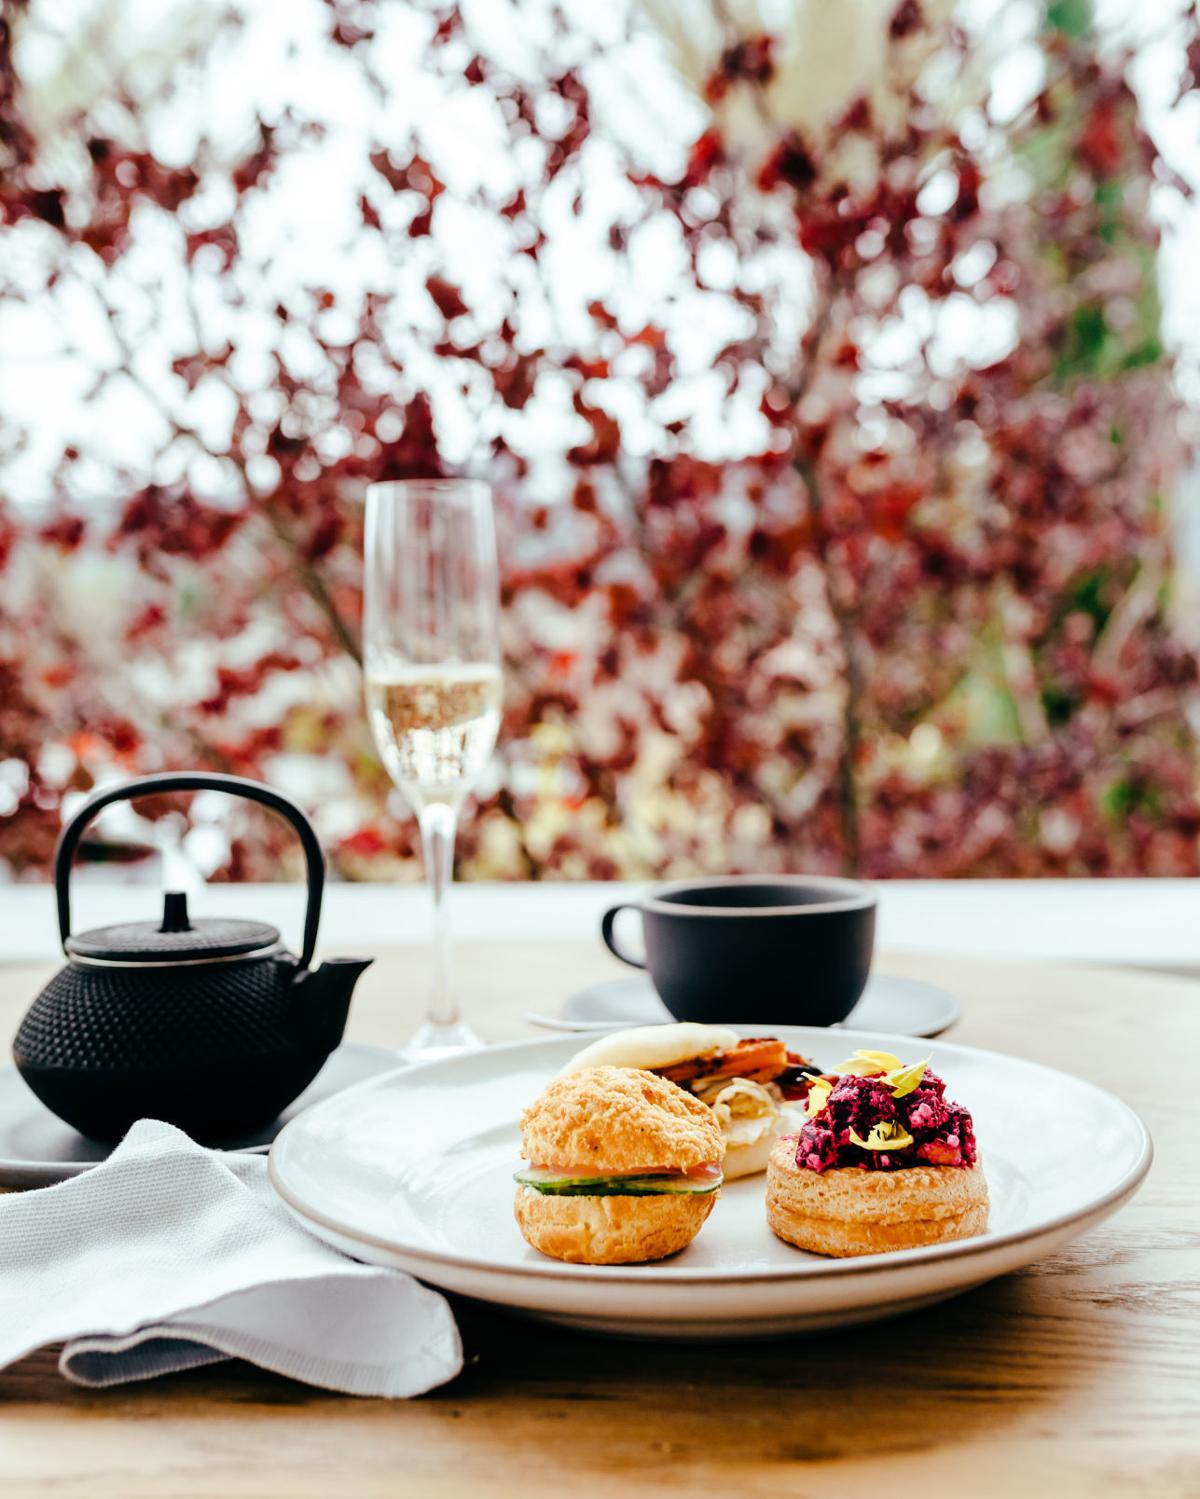 Valentine S Day Specials Romantic Restaurant Experiences Around The Valley Food Napavalleyregister Com